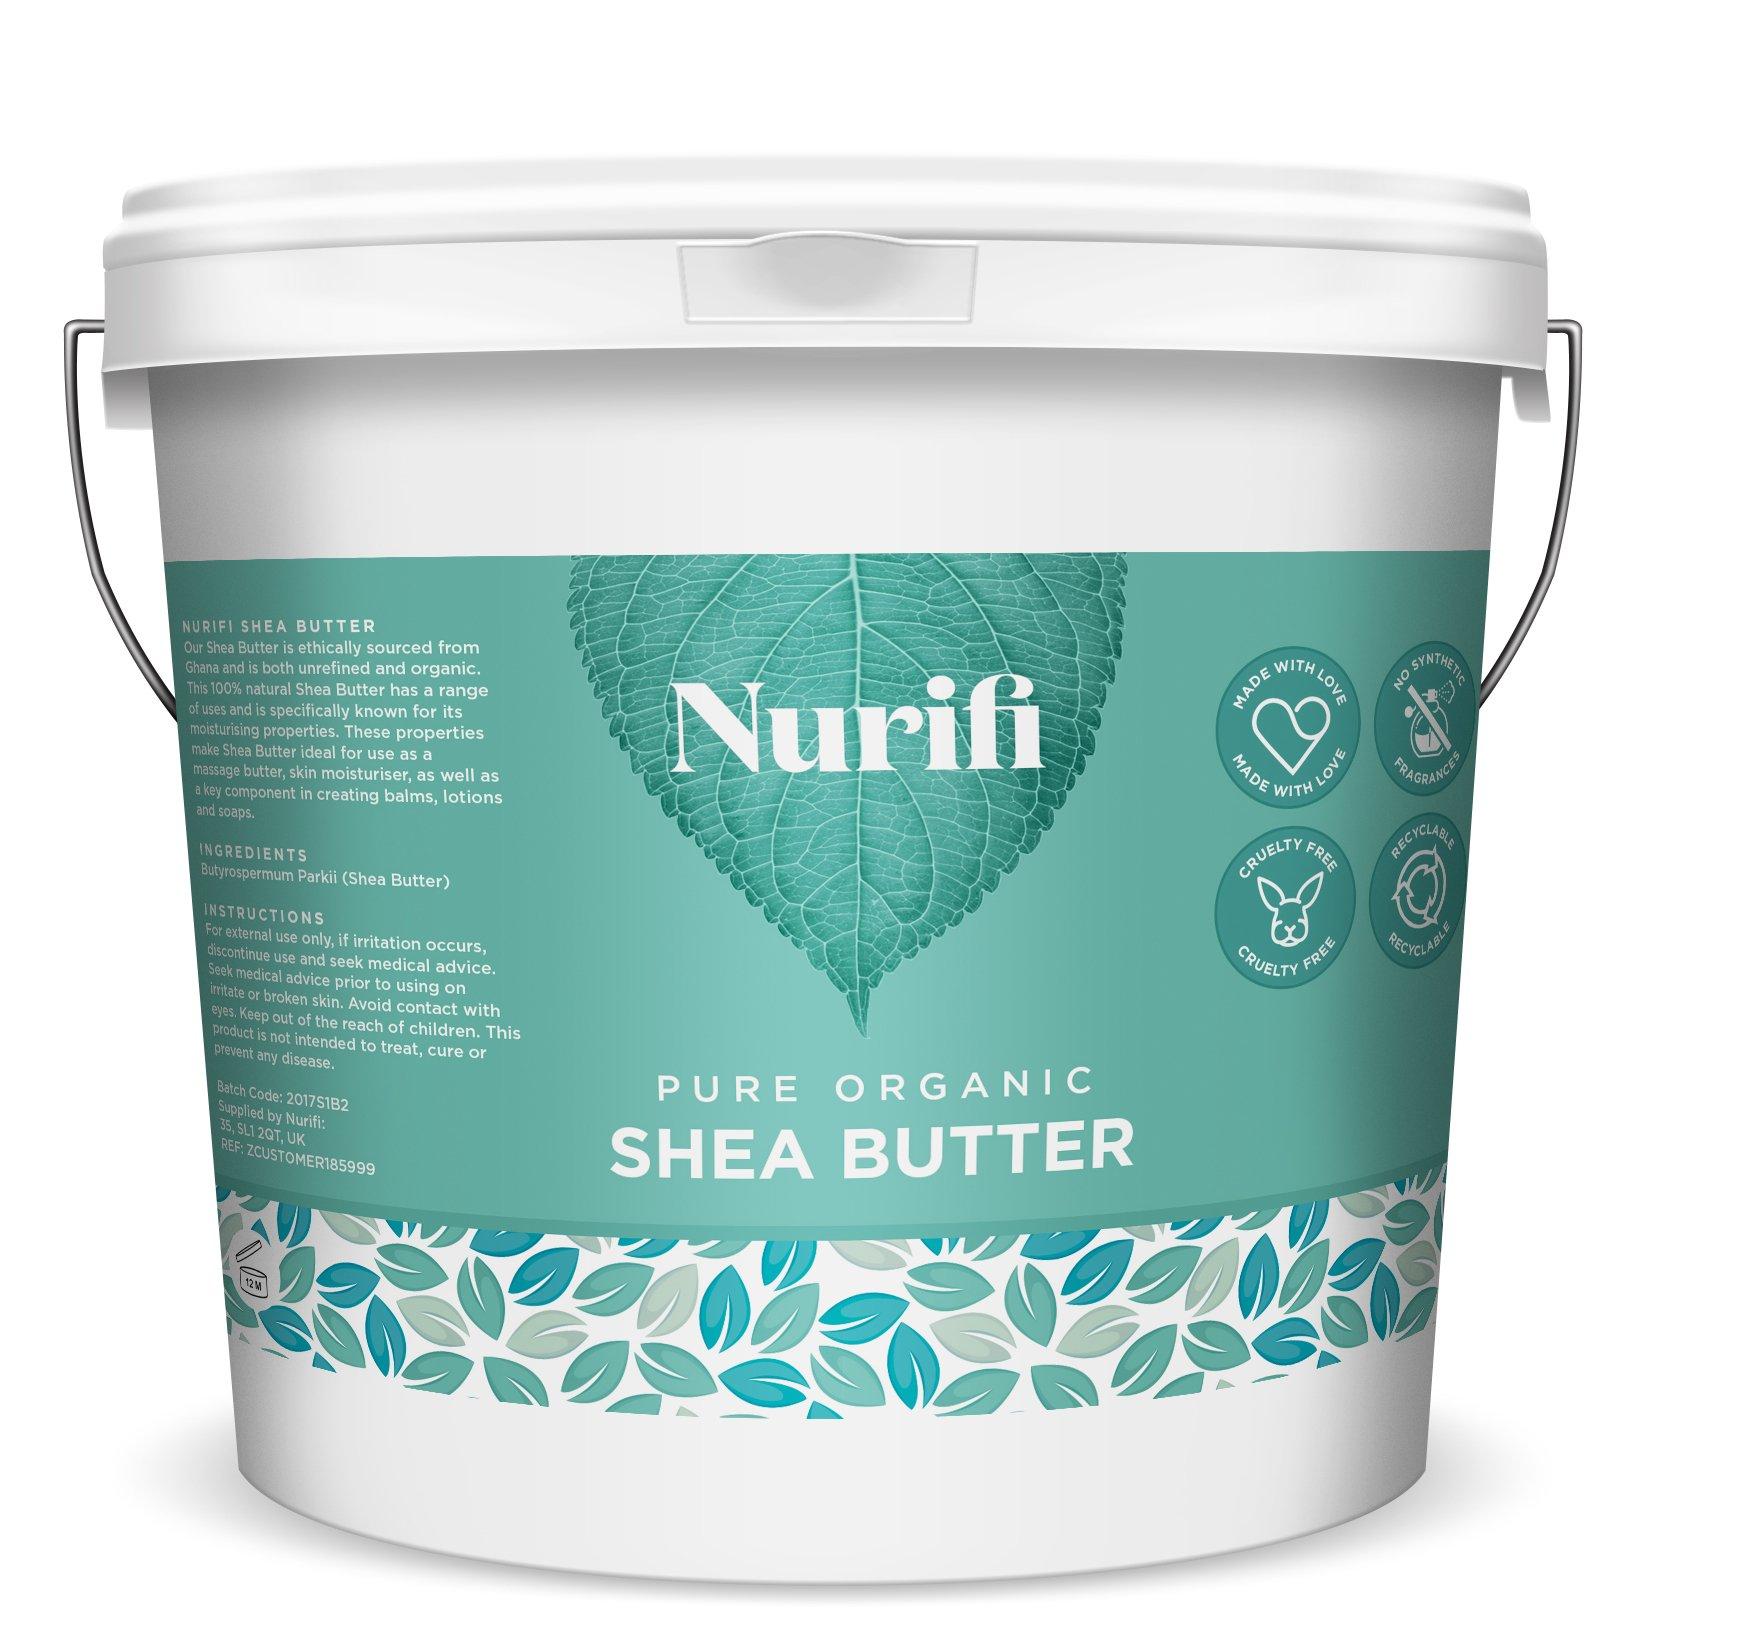 1KG Organic Shea Butter Unrefined - 100% Pure, Raw & Natural - Soil Association Certified - by Nurifi